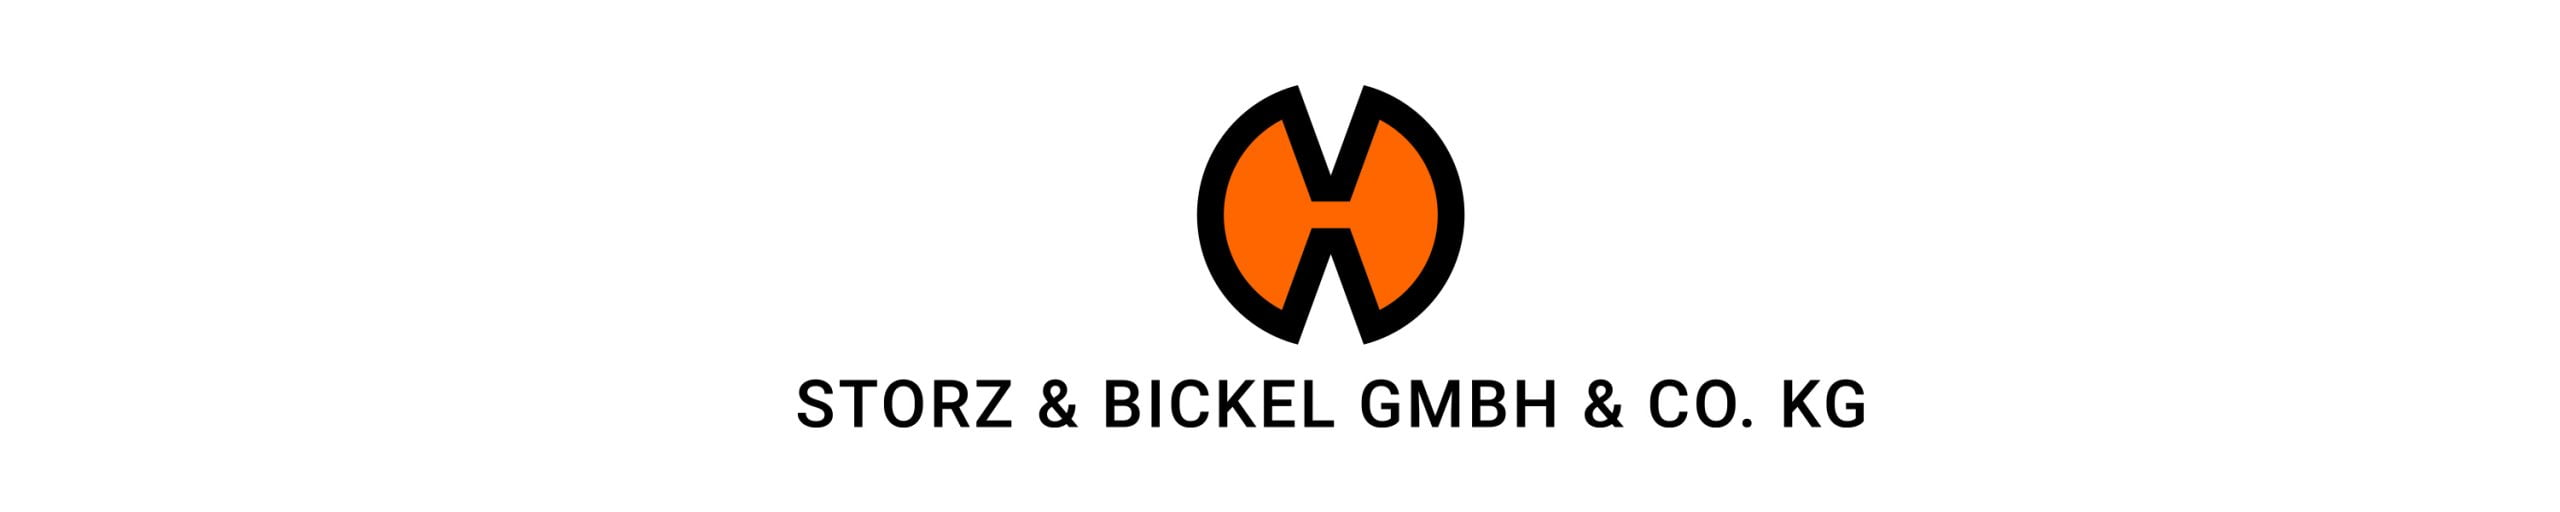 STORZ & BICKEL GMBH & CO. KG